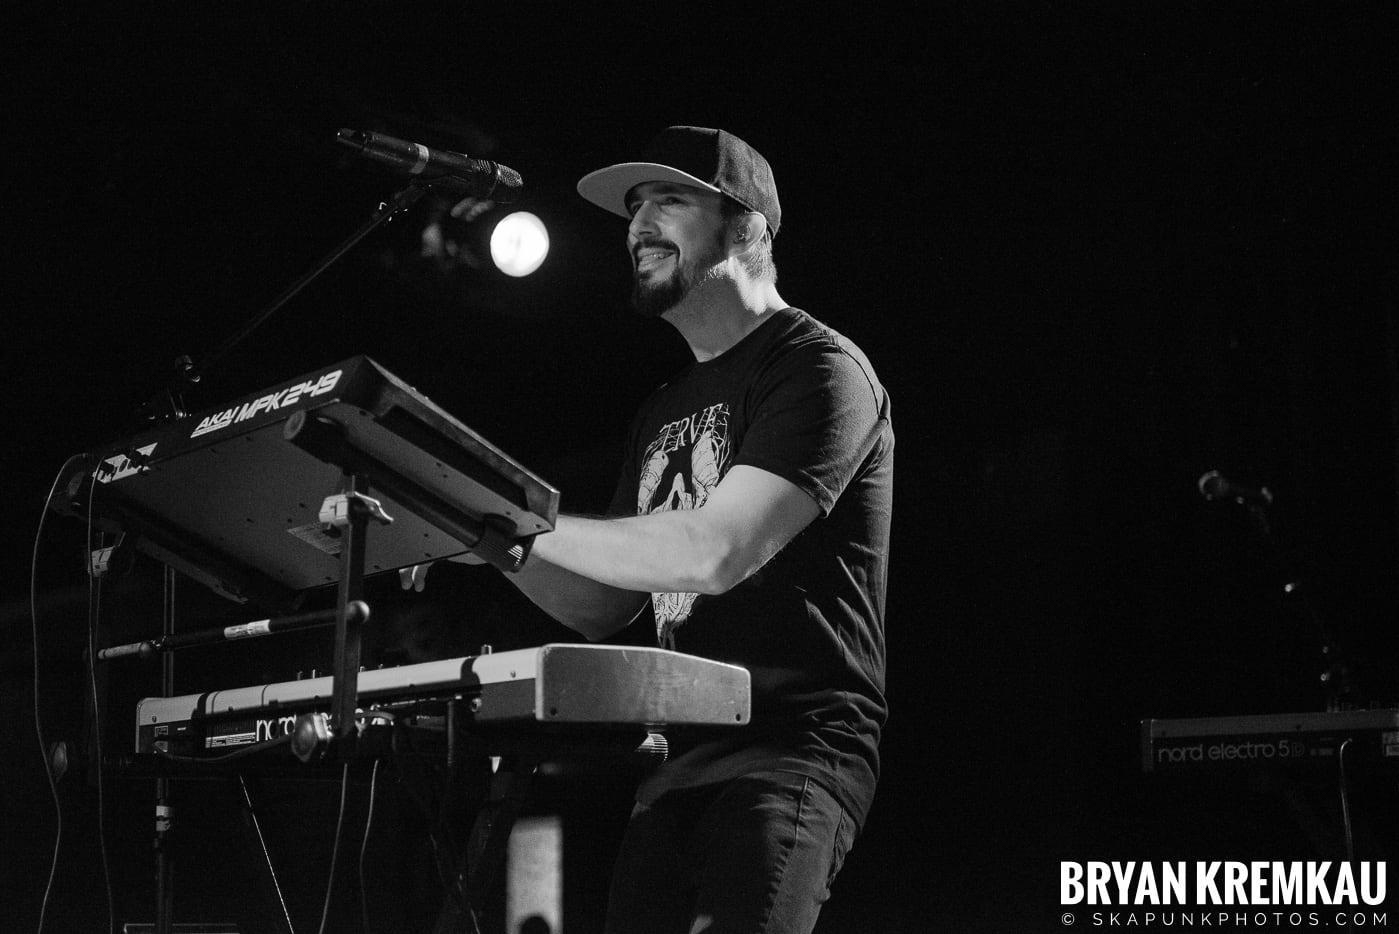 Ballyhoo! @ Starland Ballroom, Sayreville, NJ - 11.23.18 (15)